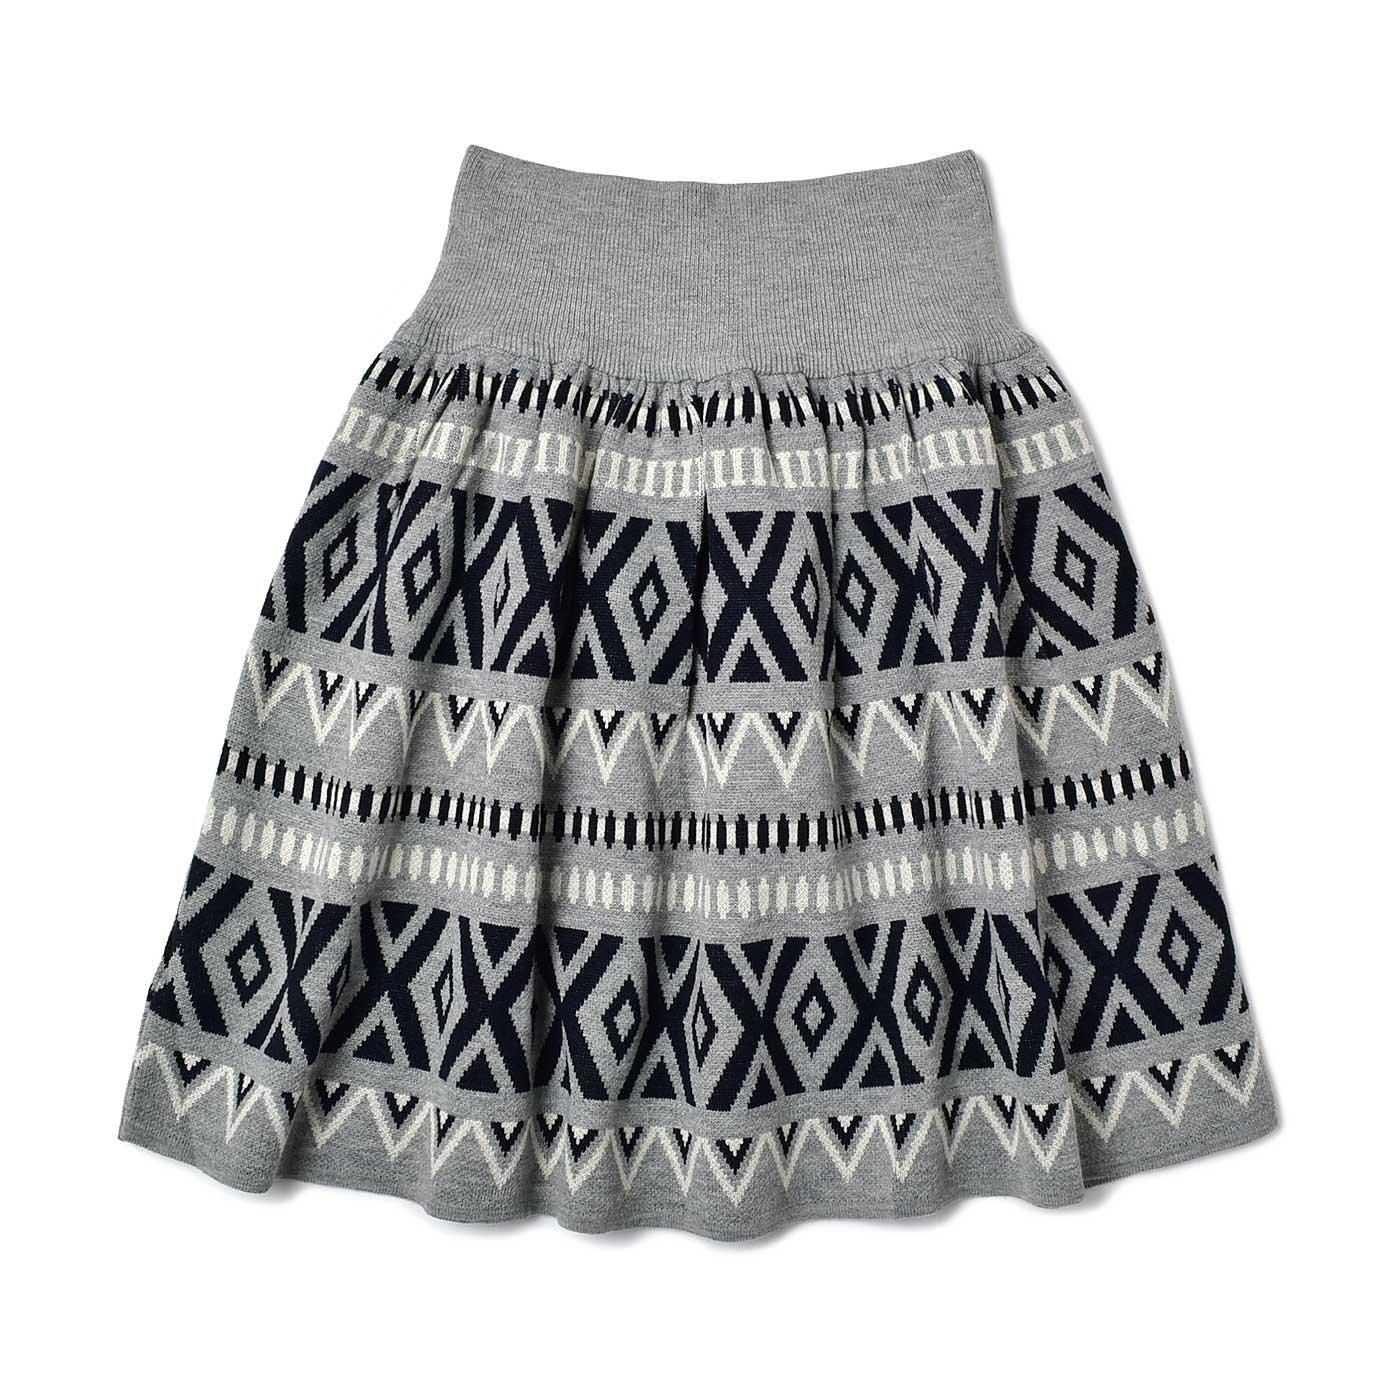 IEDIT[イディット] ジャカード柄のウエストリブニットスカート〈グレー×ブラック〉